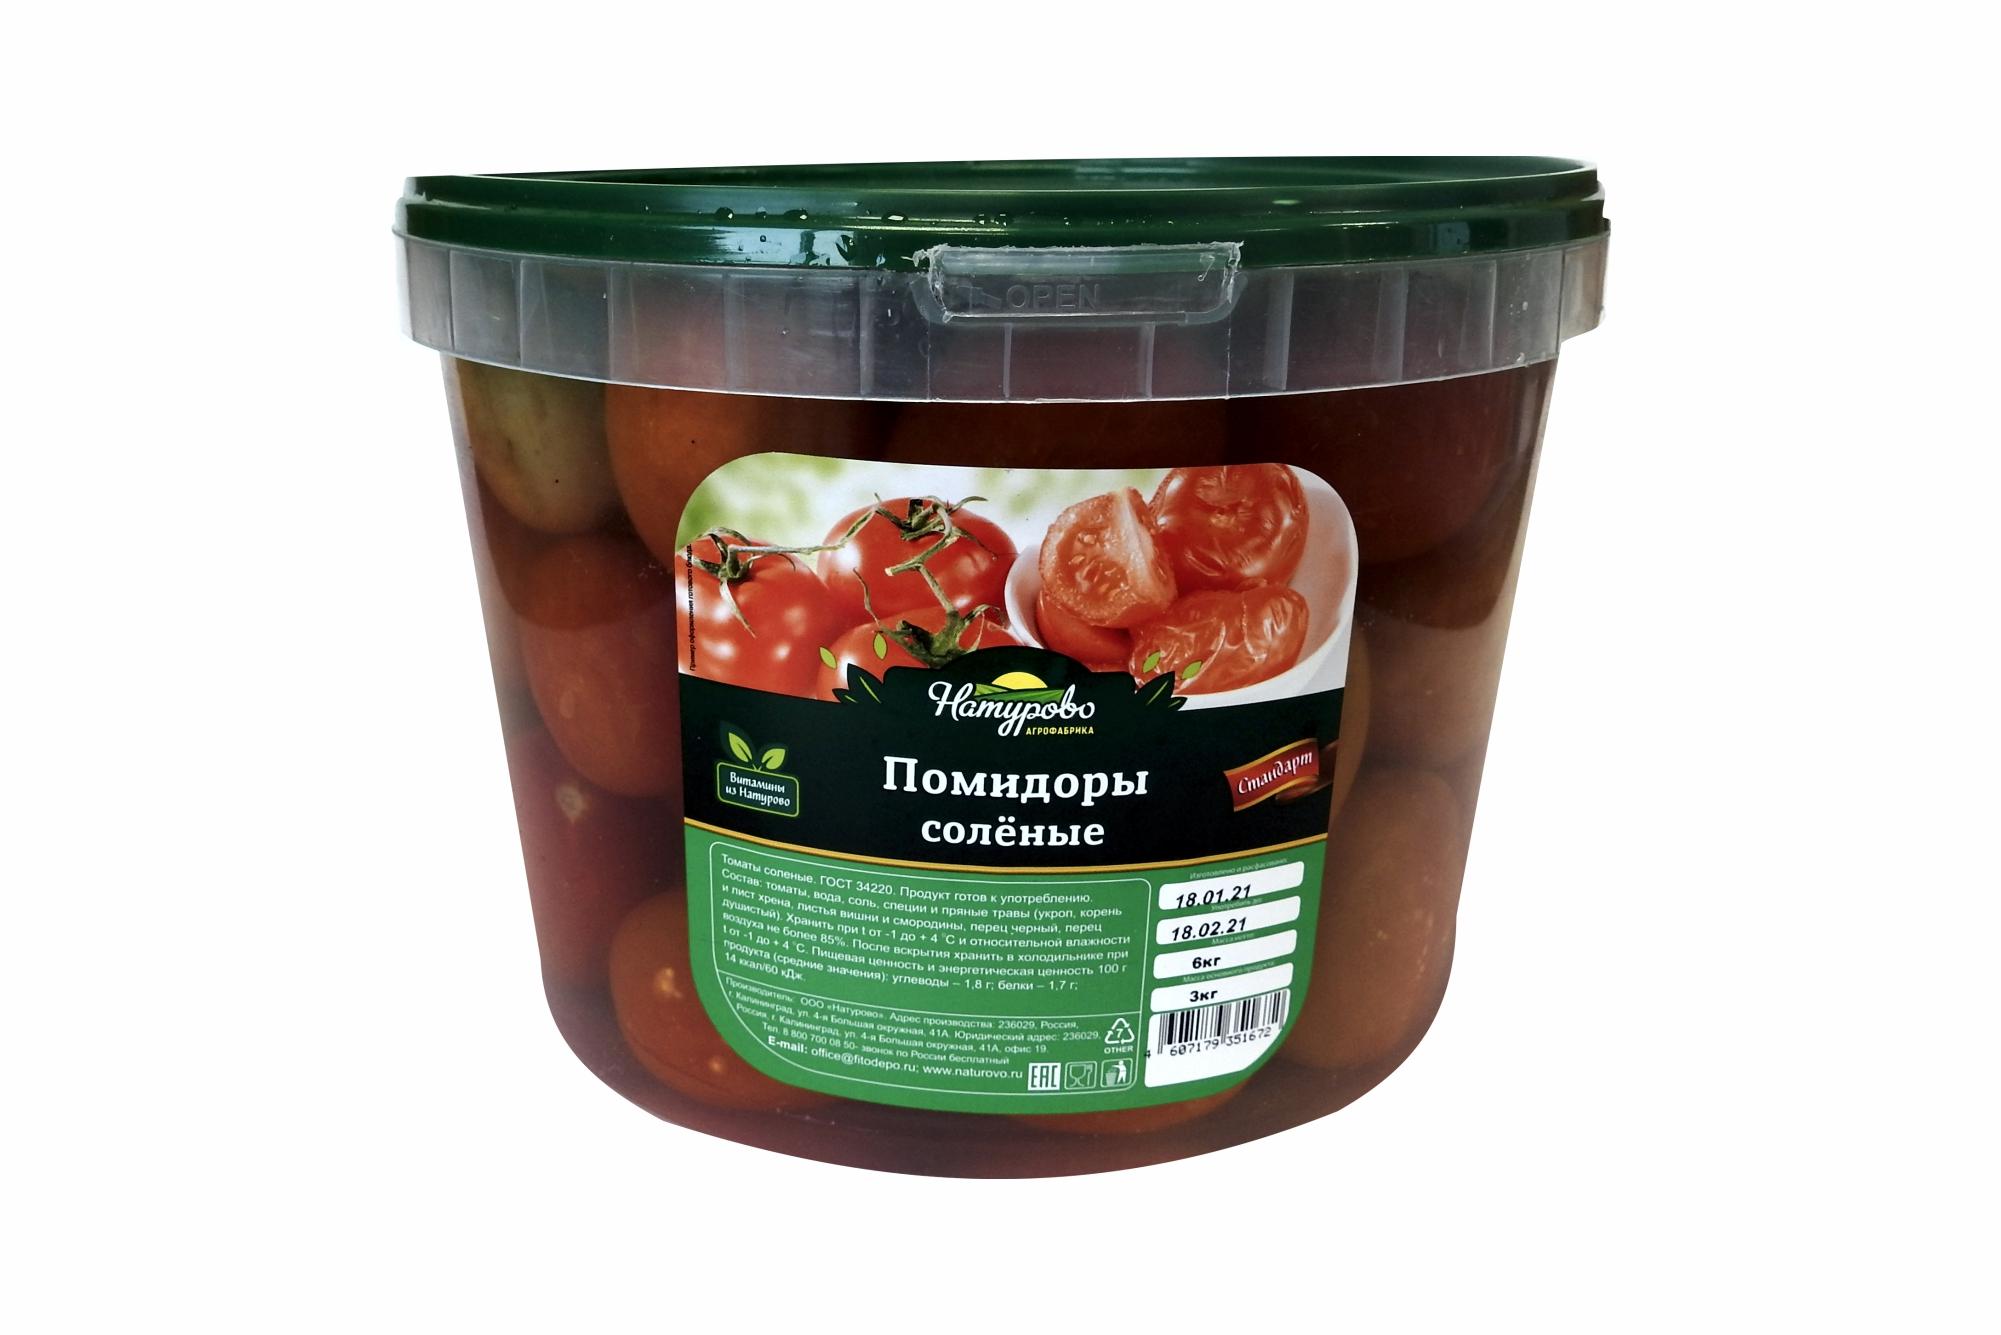 https://naturovo.ru/wp-content/uploads/2016/01/pomidory-solenye-krasnye-3kg.jpg